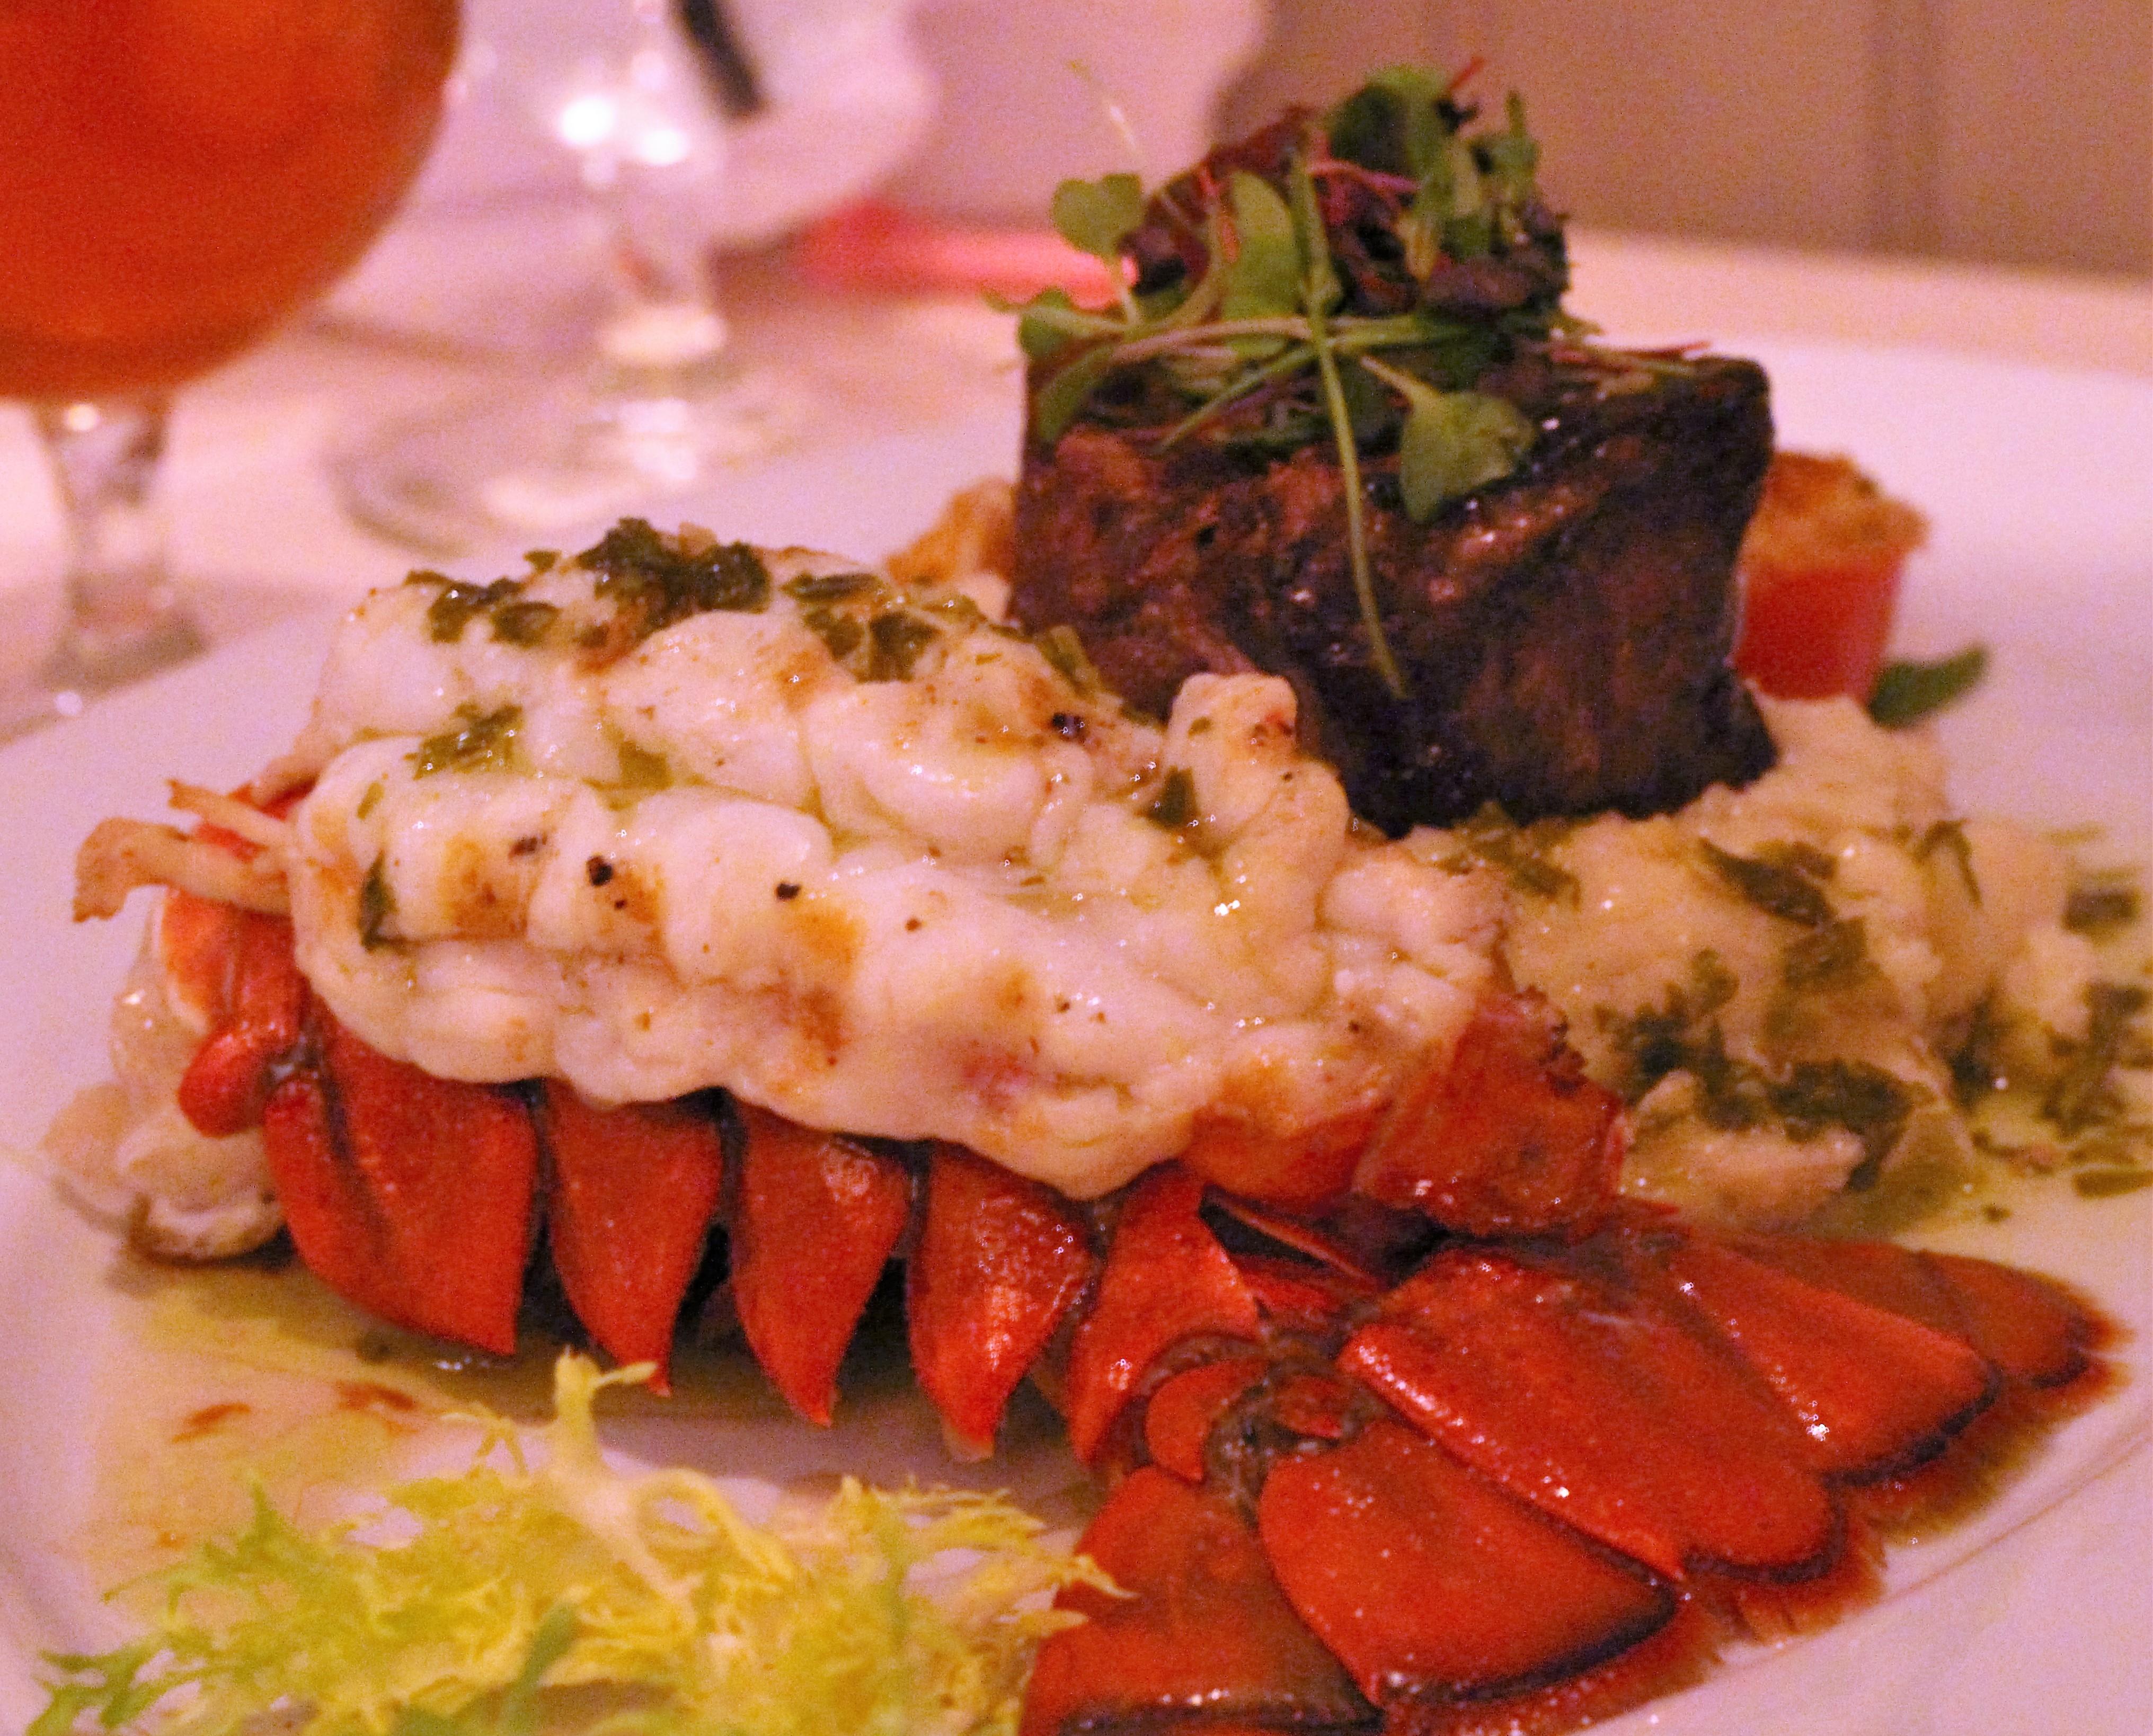 margarita, cosmopolitan, Table 13, Addison, Texas, steak, seafood, Sinatra. lobster